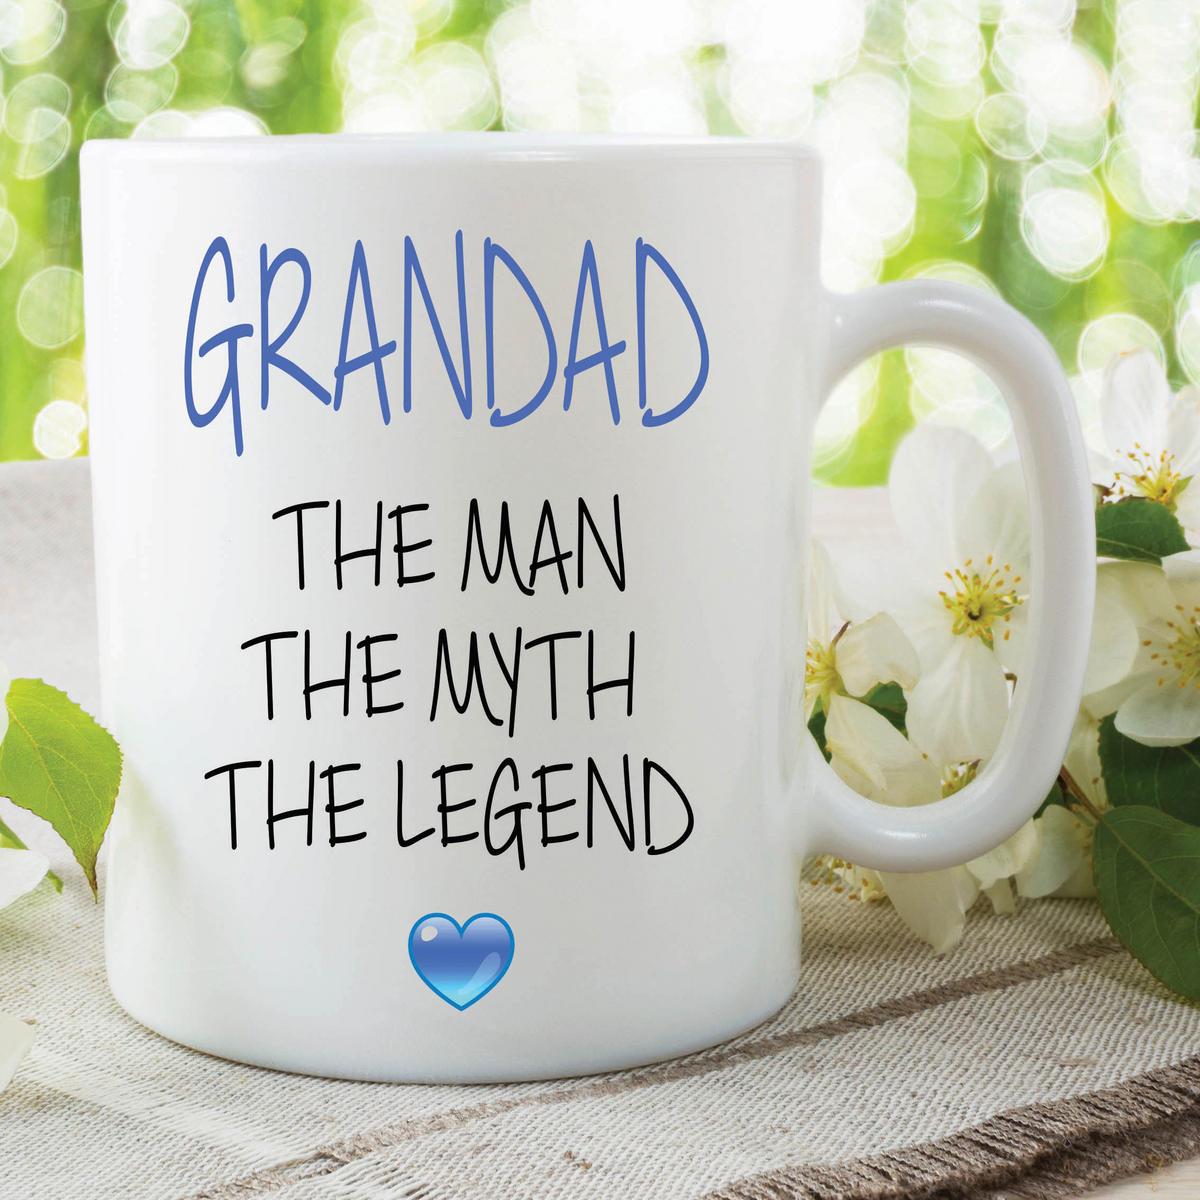 Novelty Grandad Mug The Man The Myth The Legend Gift Fathers Day Cup WSDMUG638